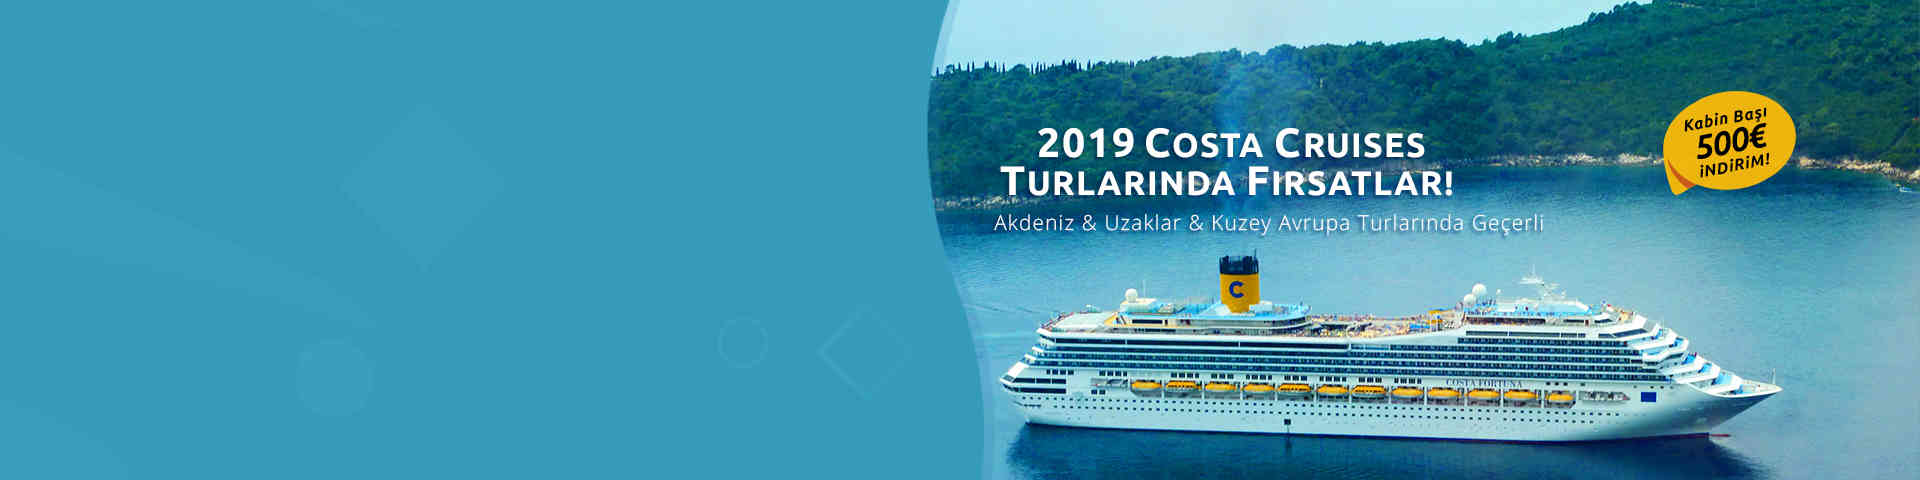 Costa Cruises Turları